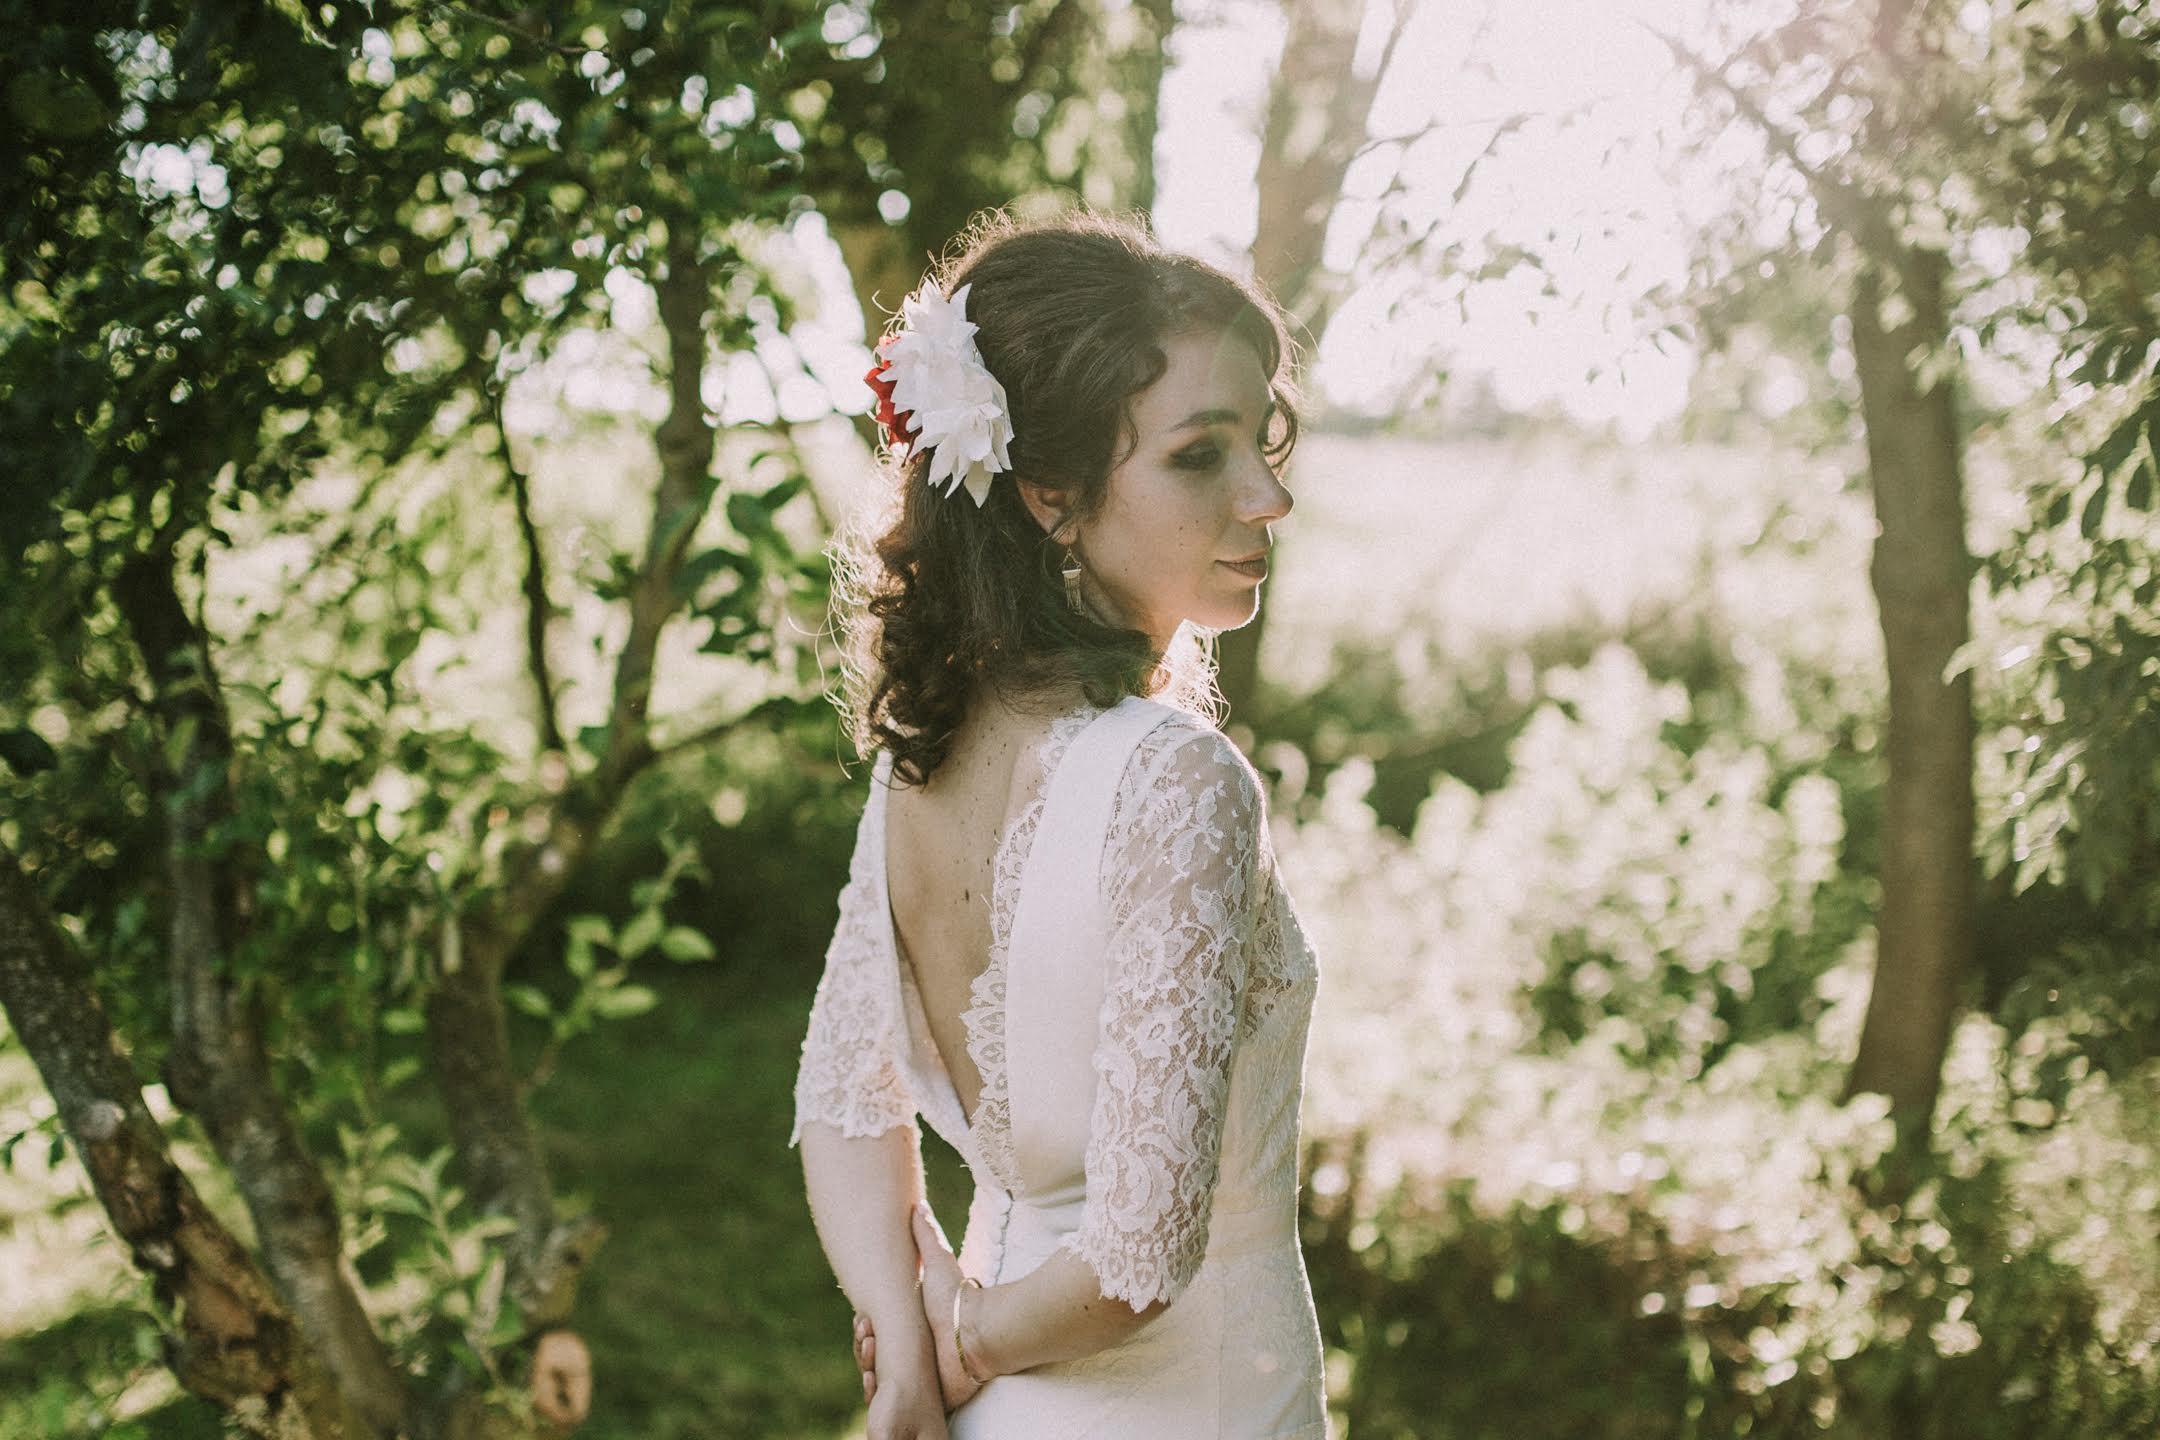 Mariage de Stéphanie